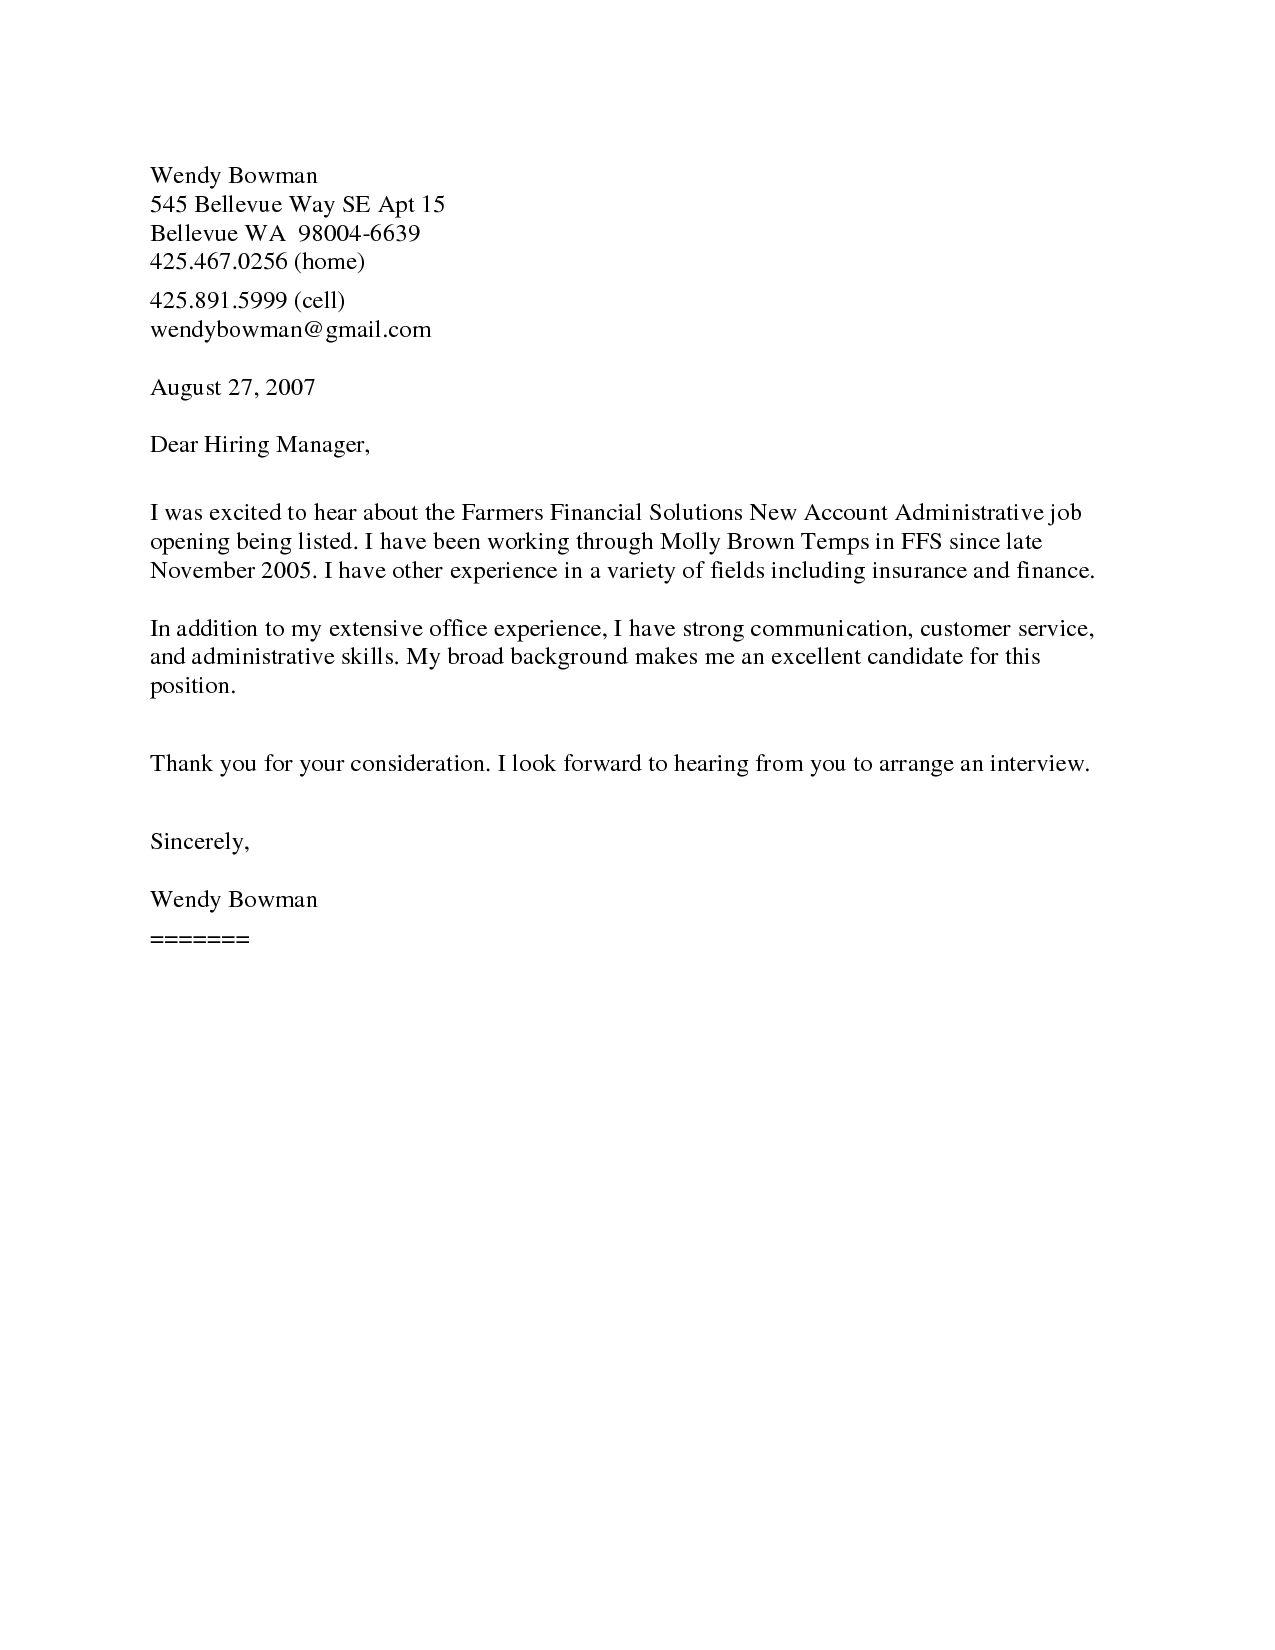 27 General Cover Letter Sample  Letter sample  Resume cover letter examples Cover letter for